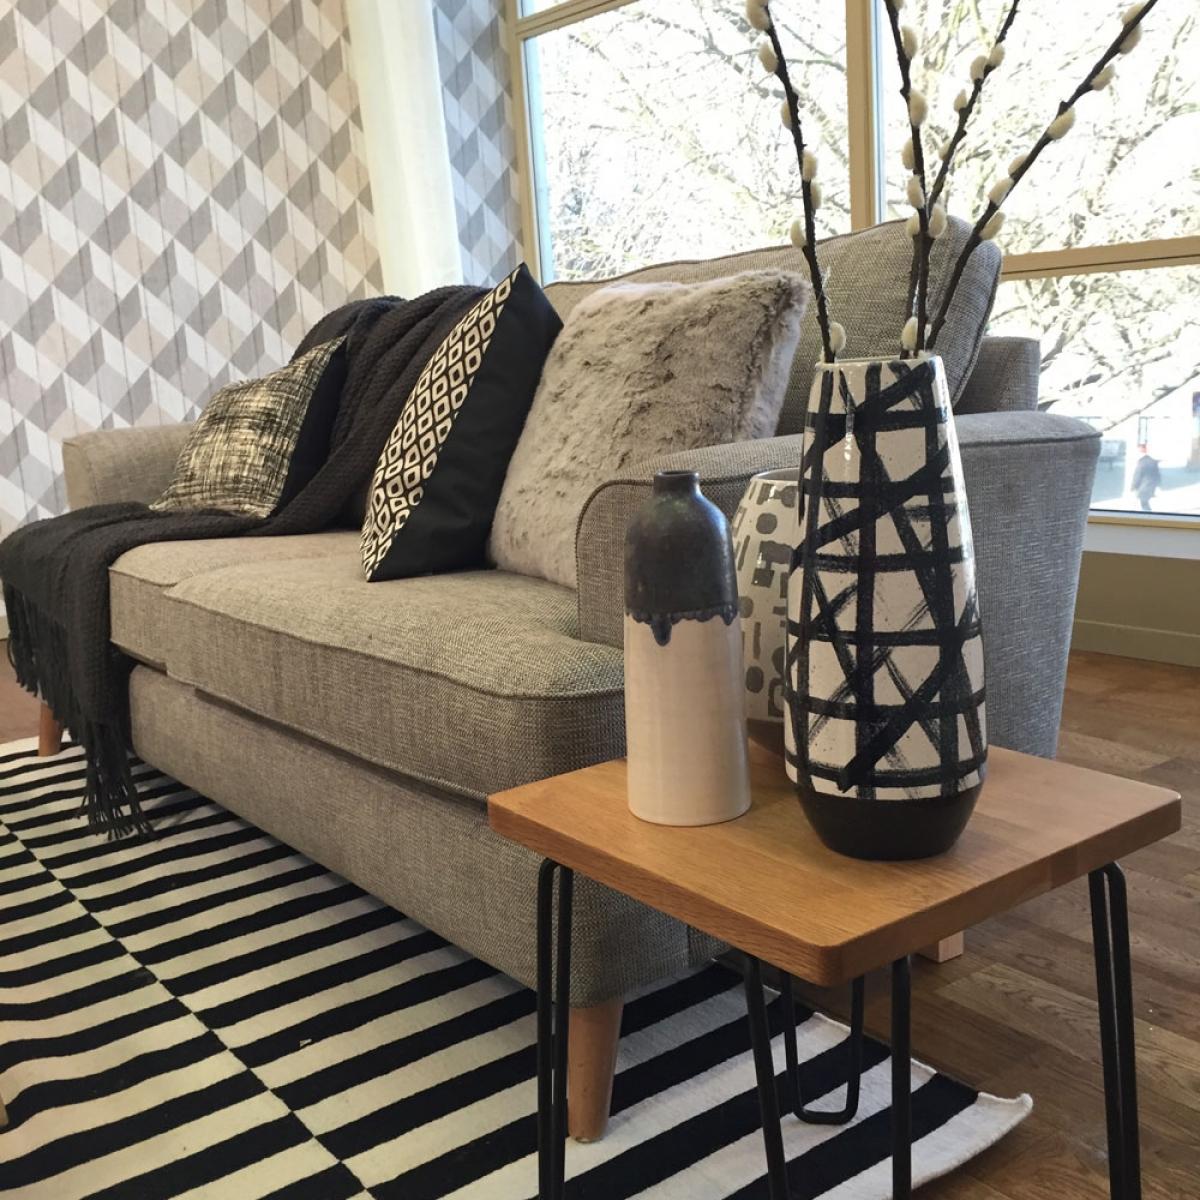 Scandinavian interior design habitat vases